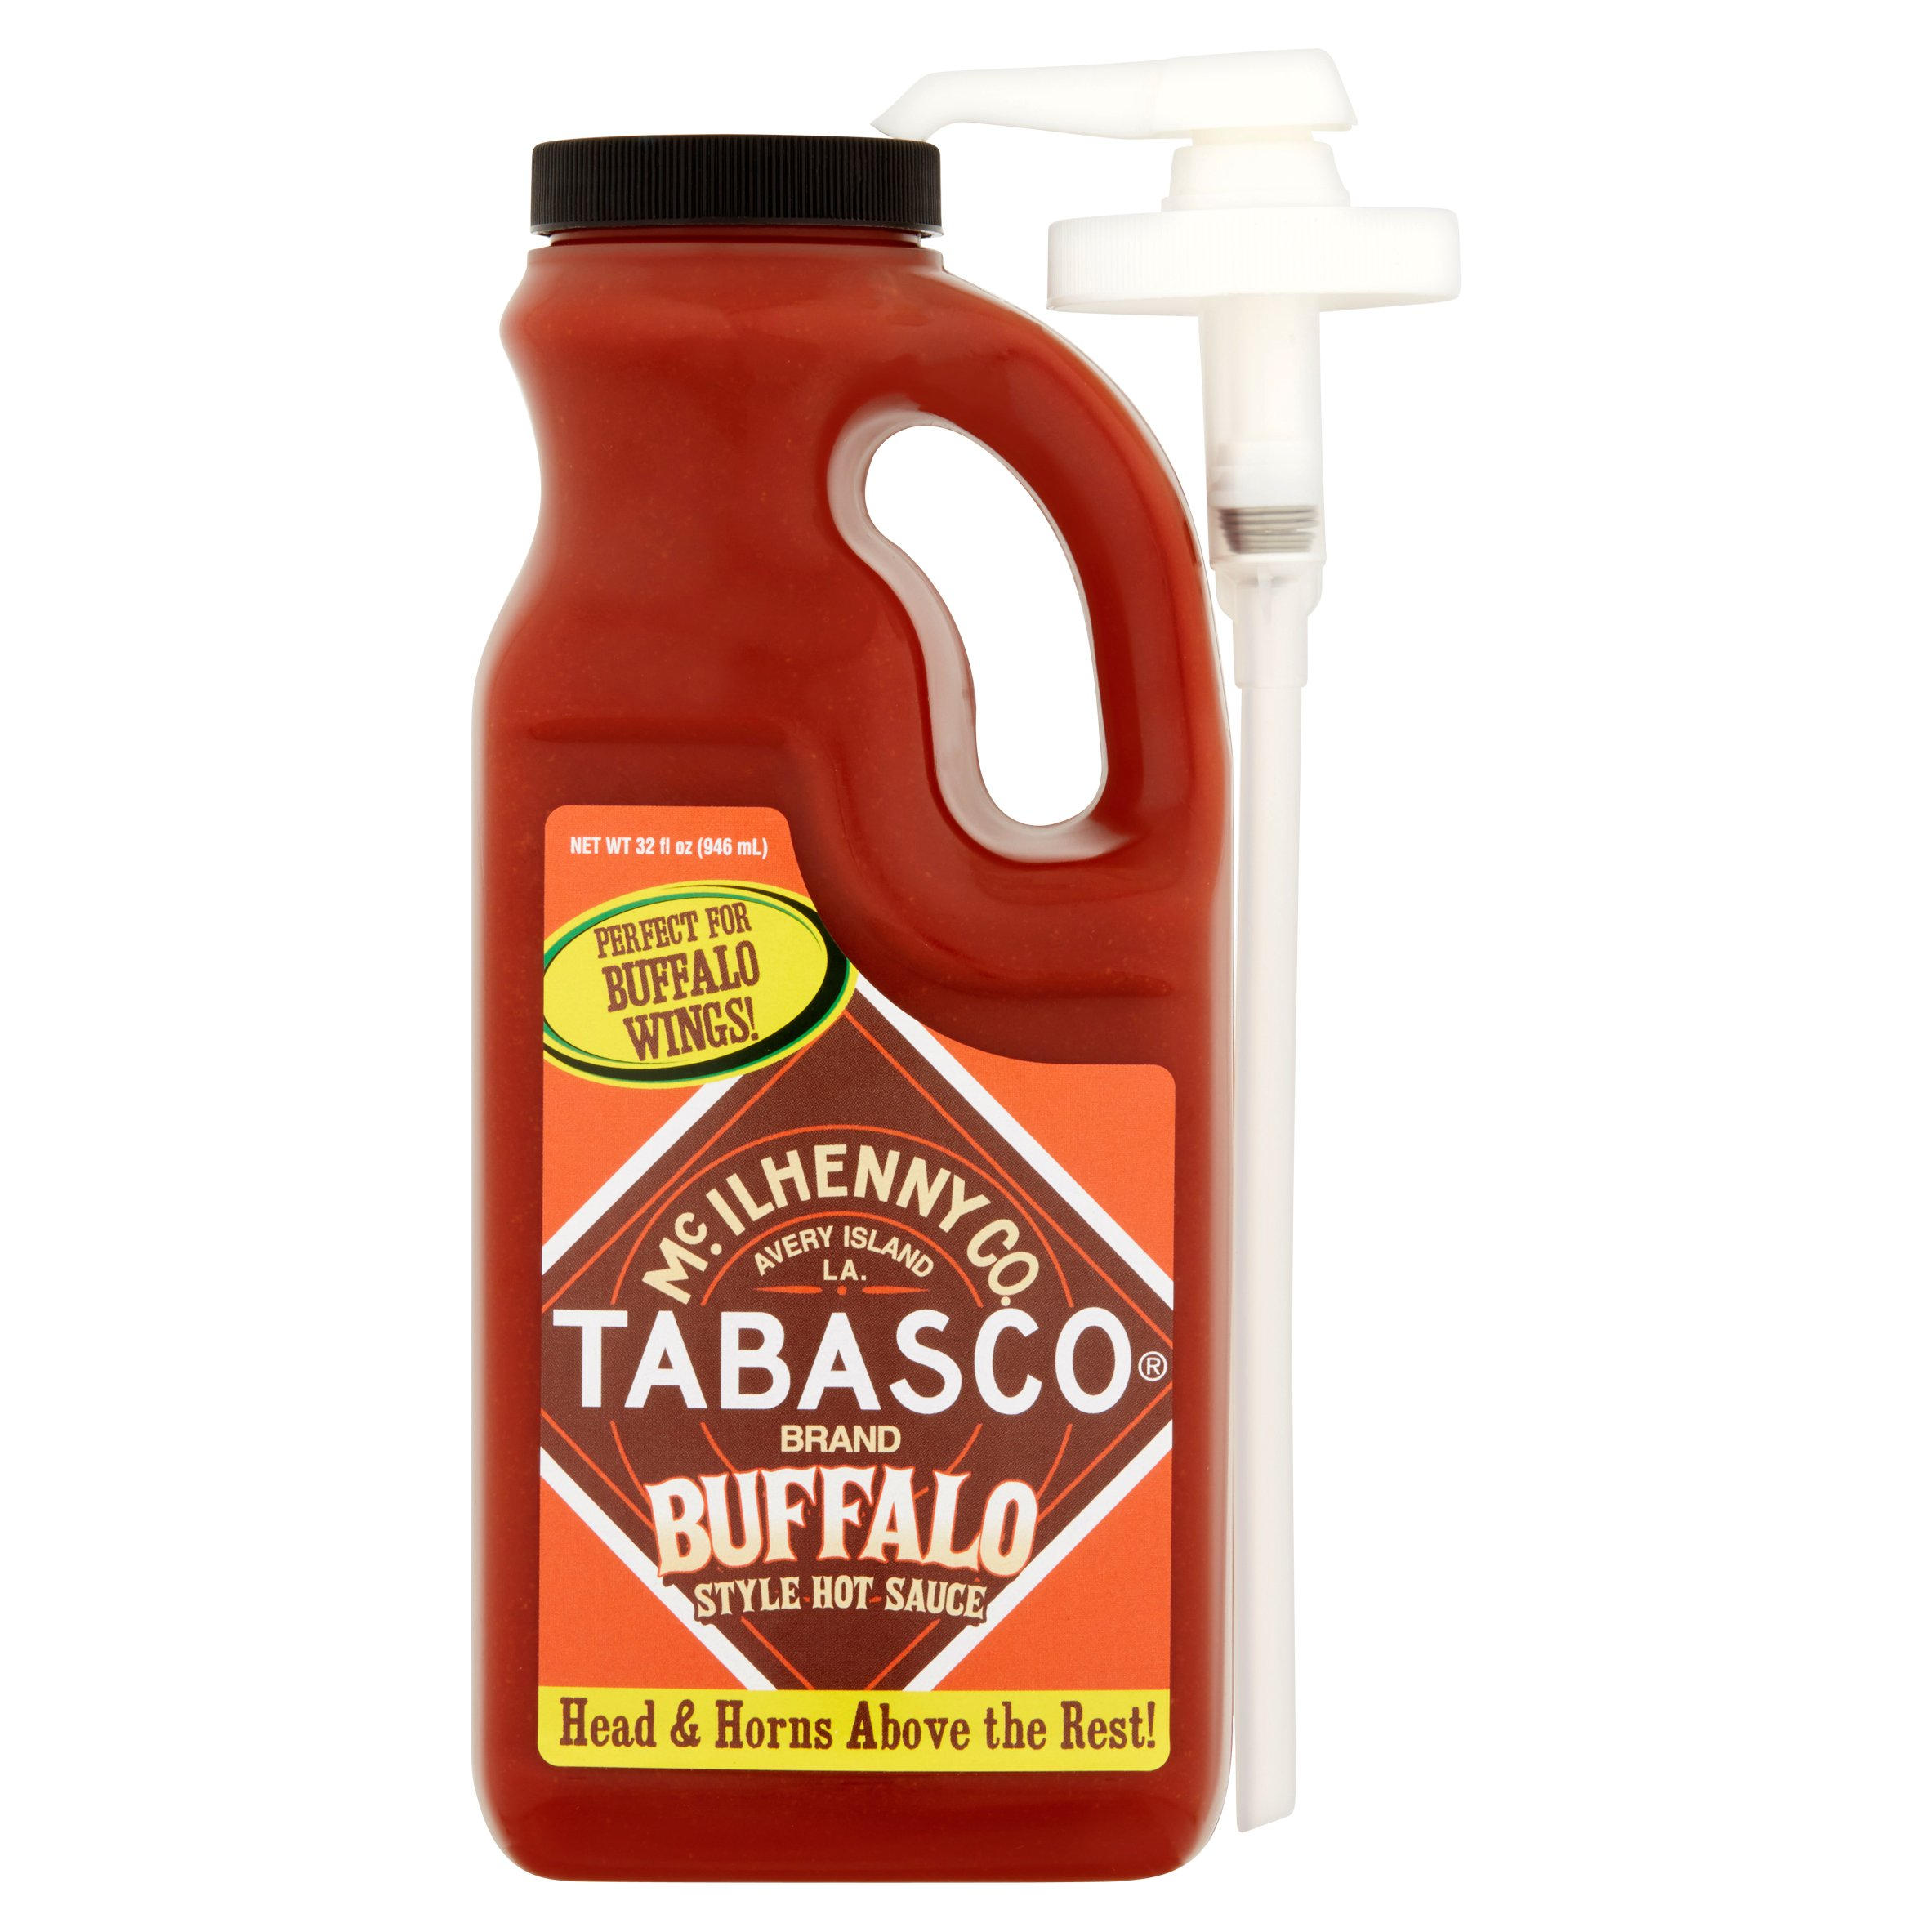 McIlhenny Co. TABASCO Brand Buffalo Style Hot Sauce, 32 fl oz by McIlhenny Company